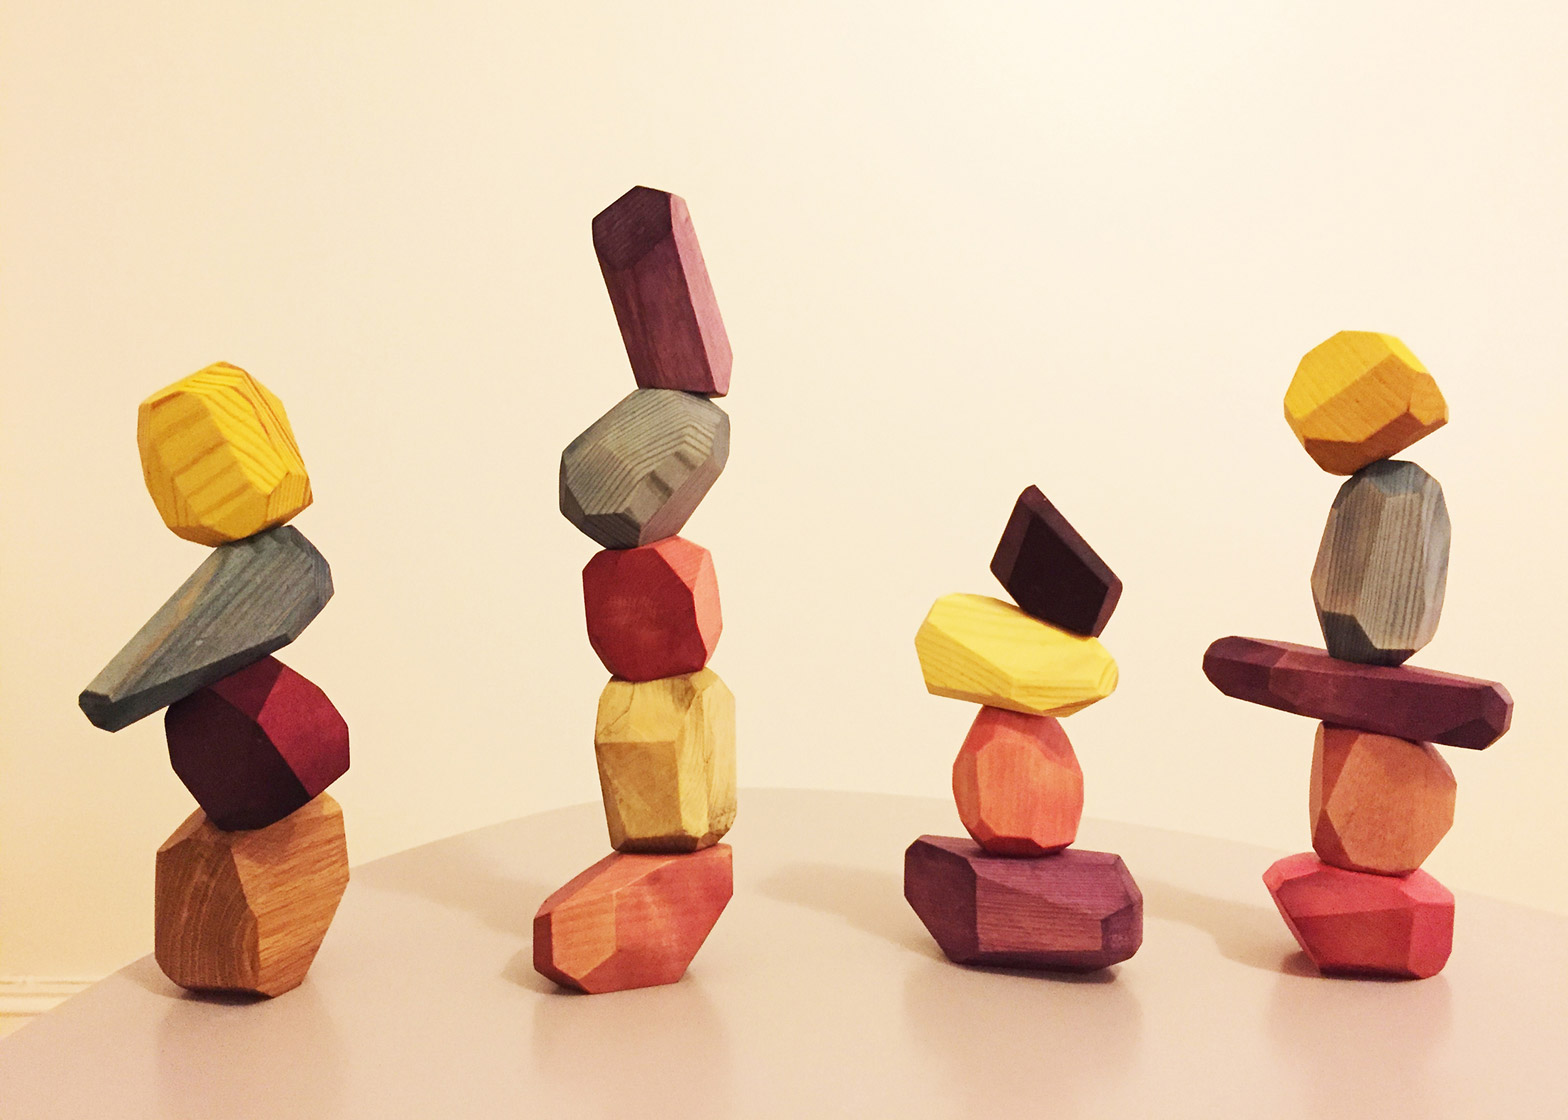 Snego building blocks